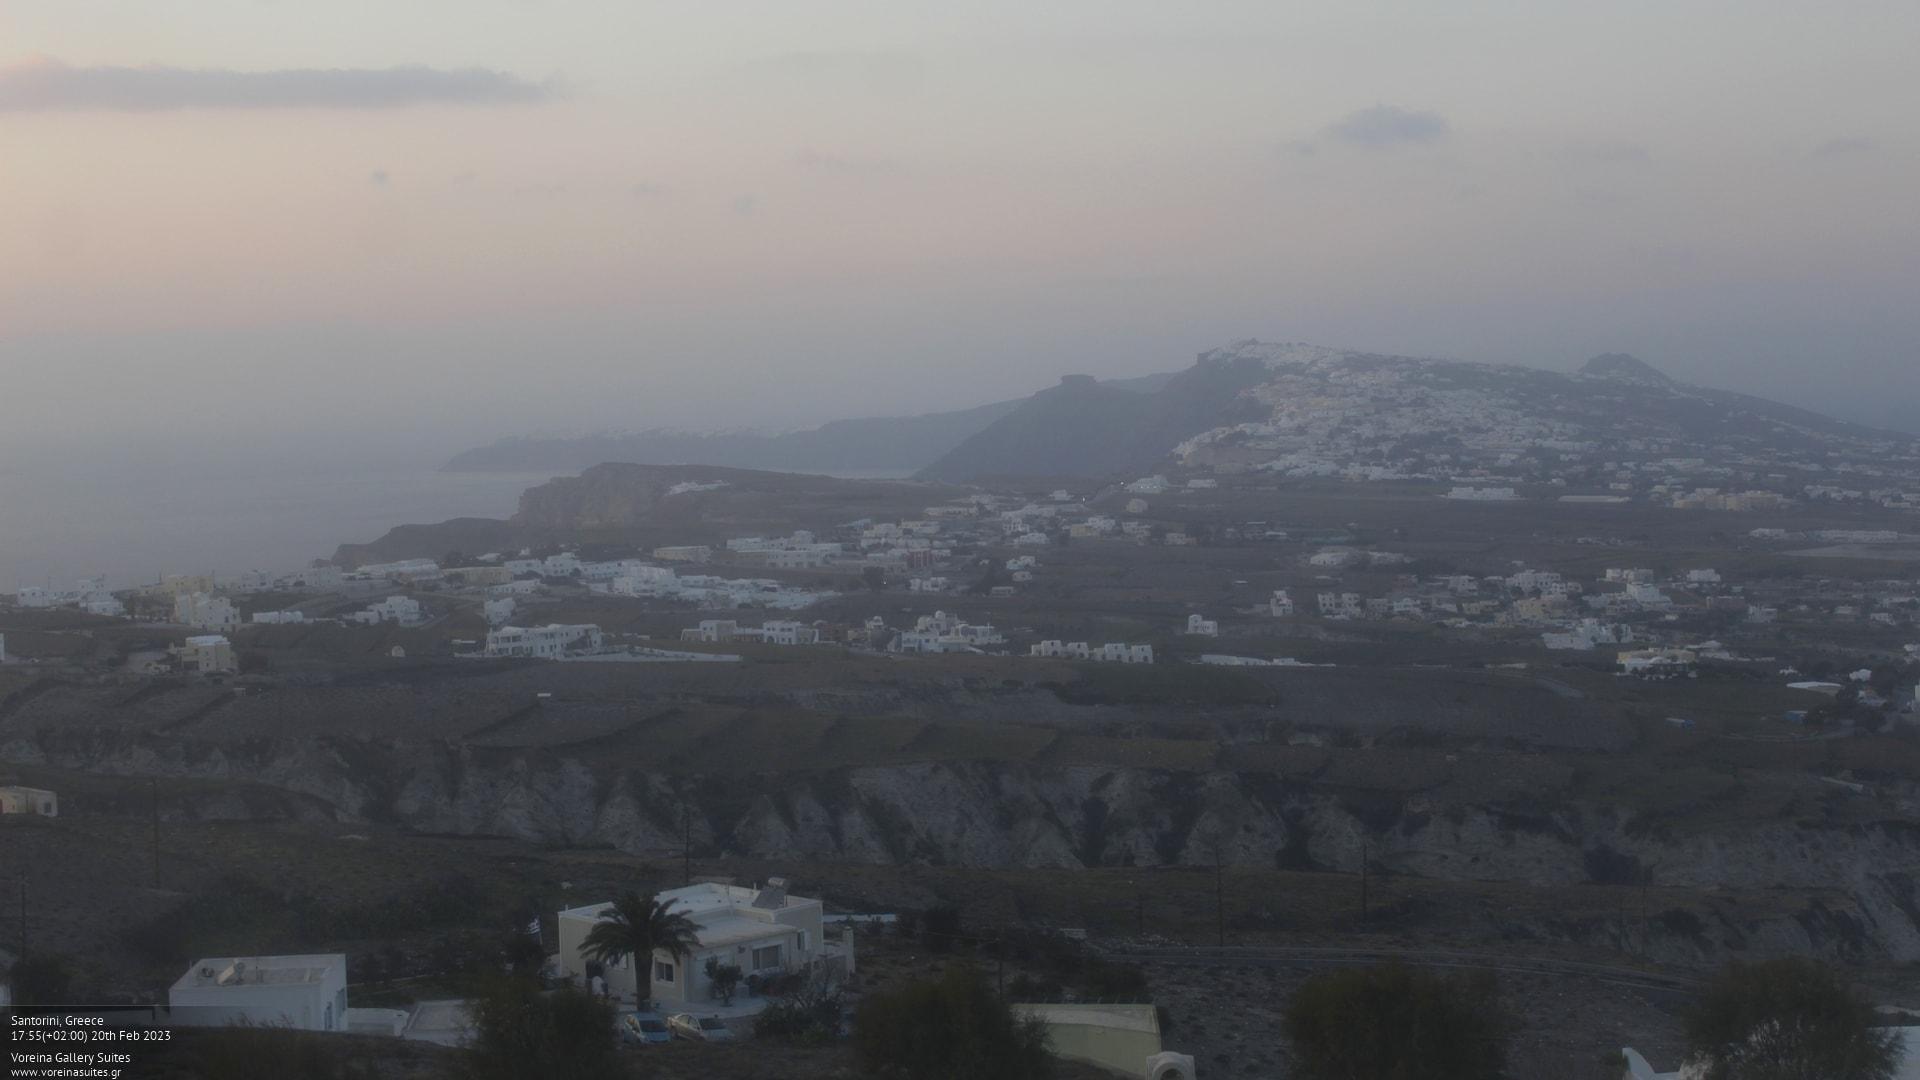 Webkamera Santorini: Santorino − Voreina Gallery Suites°